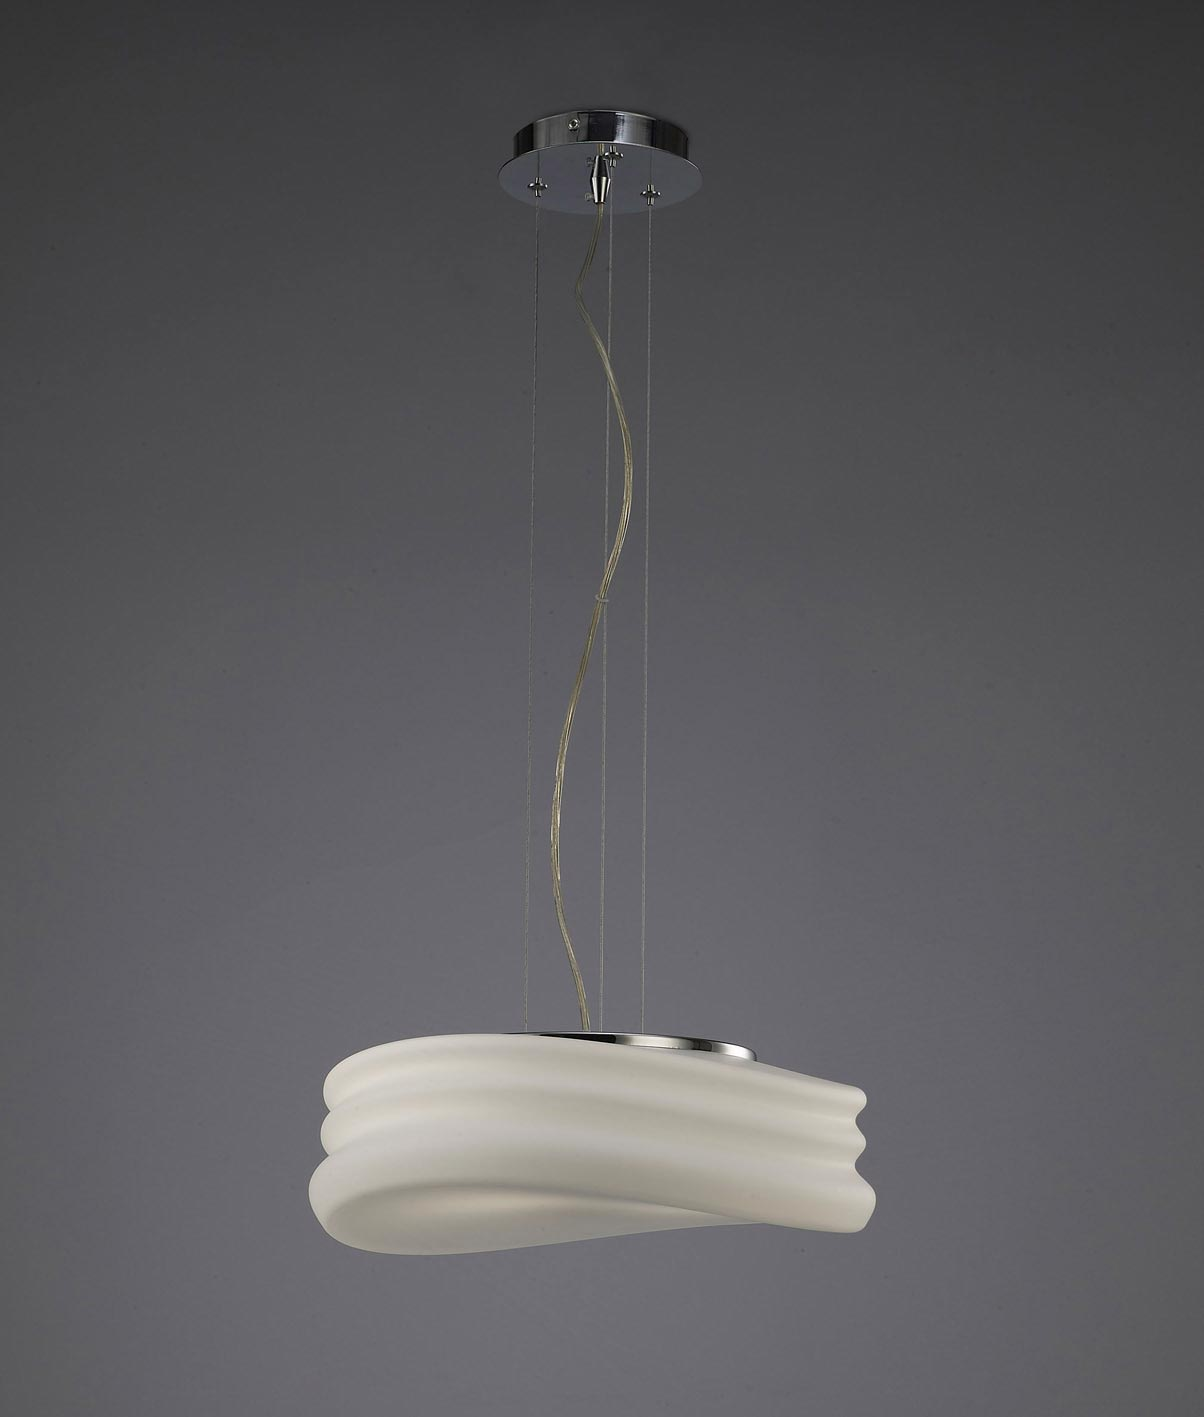 Lámpara colgante mediana MEDITERRANEO cromo/cristal opal 2 luces